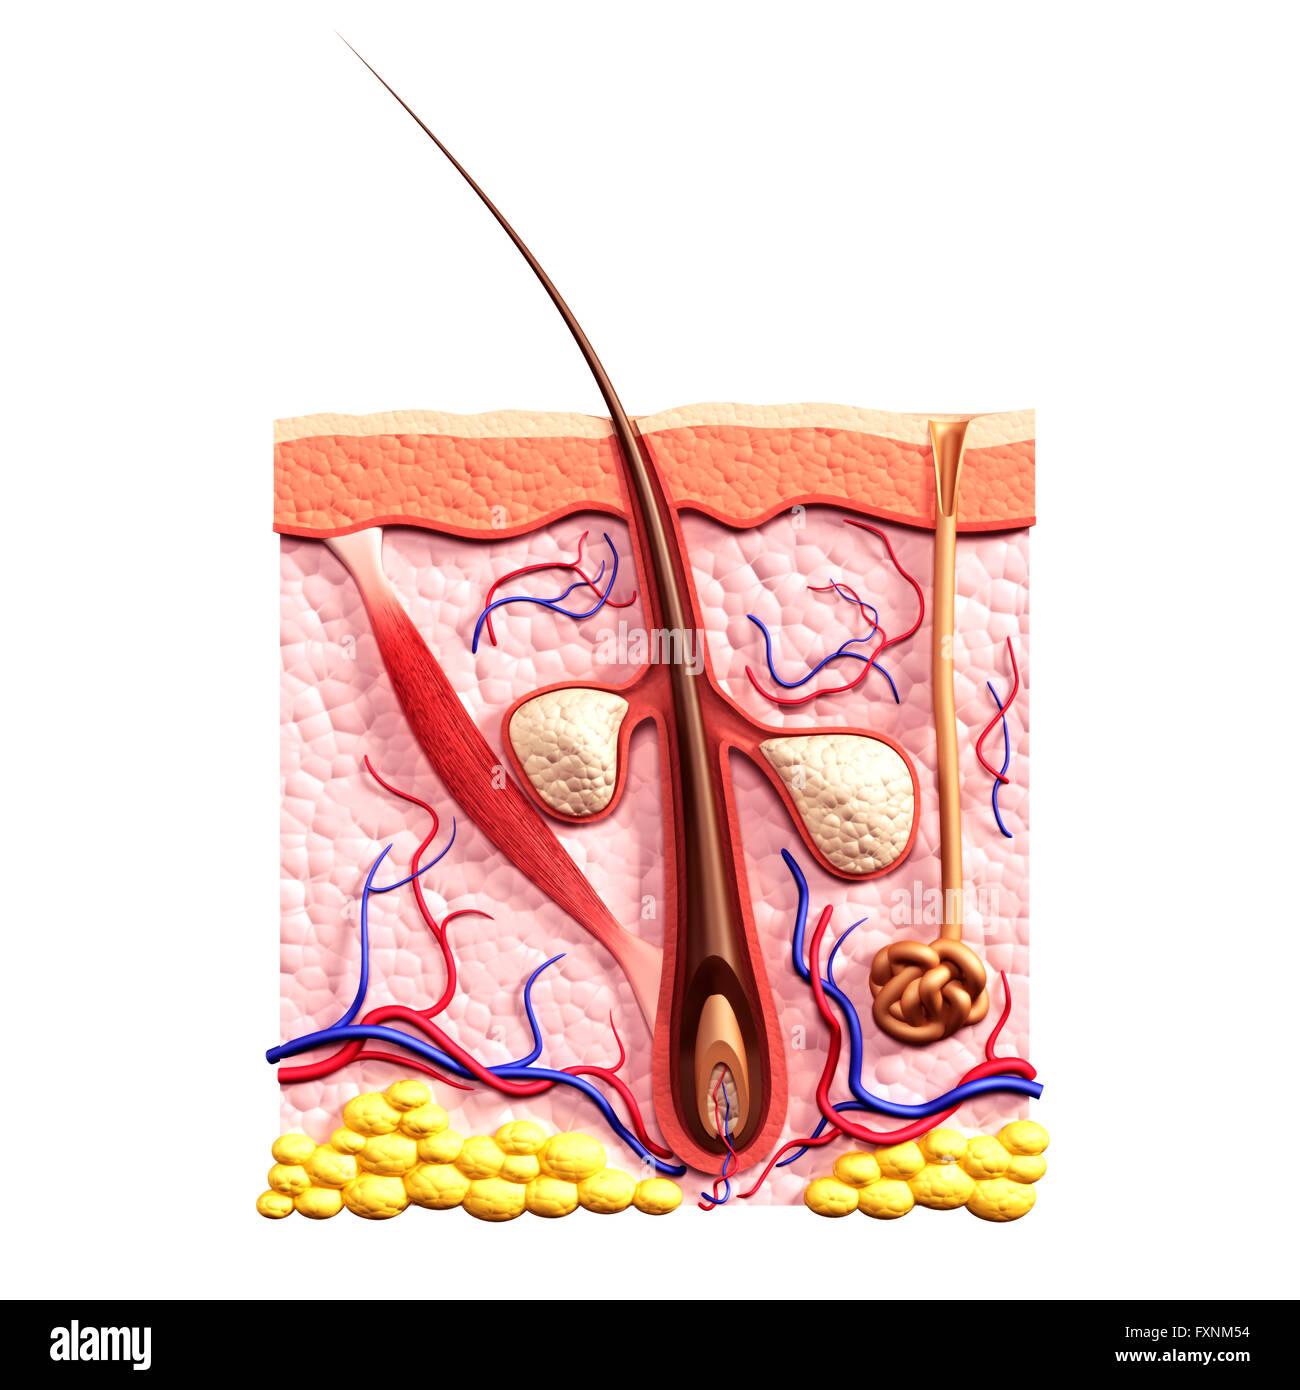 Querschnitt der Haut zeigen, Haarfollikel, Talgdrüsen, Schweißdrüsen ...